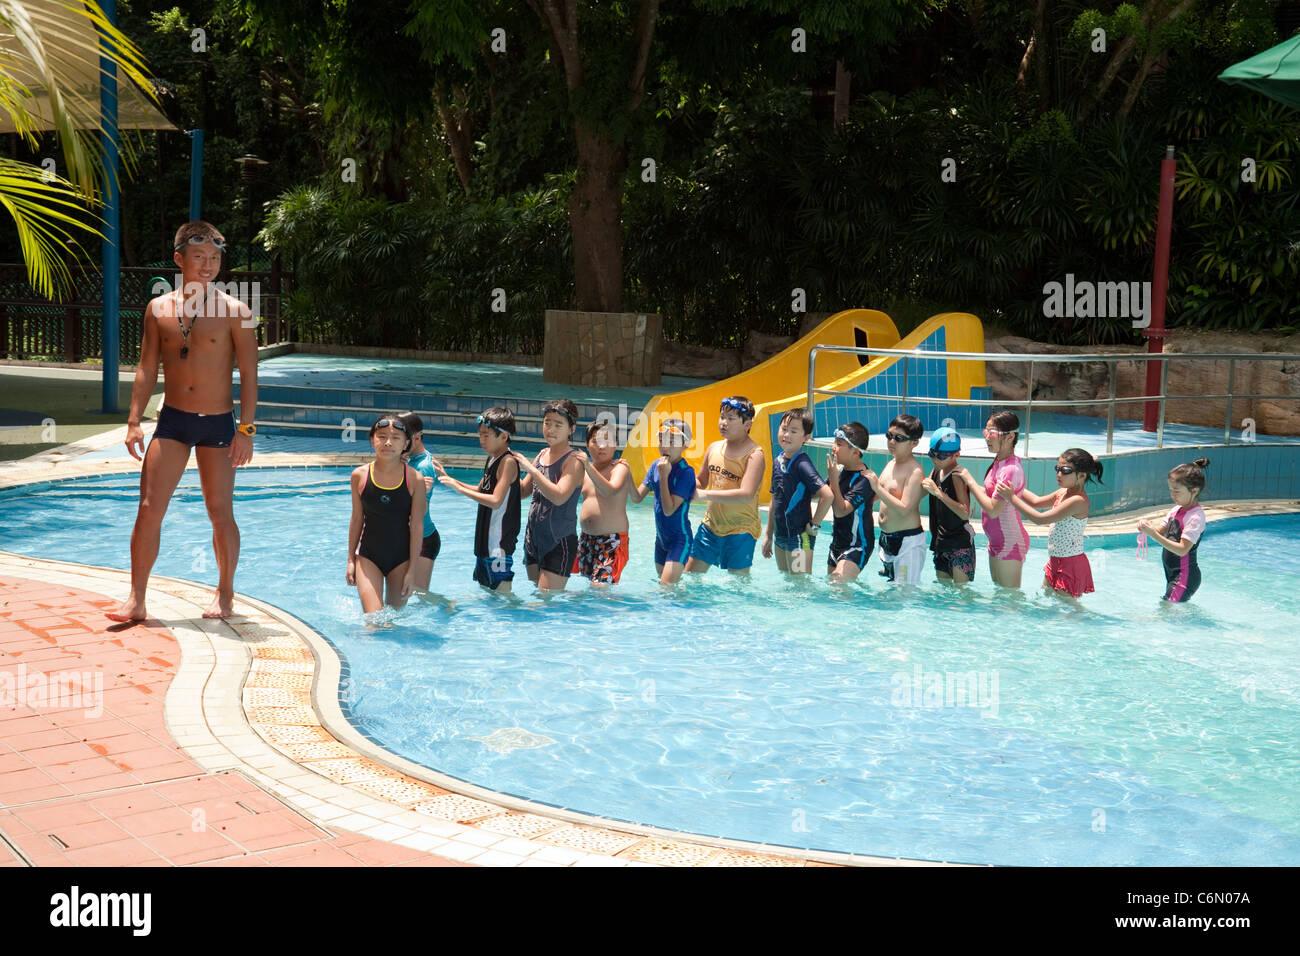 Primary schoolchildren having a swimming lesson with their teacher, Singapore, Asia Stock Photo